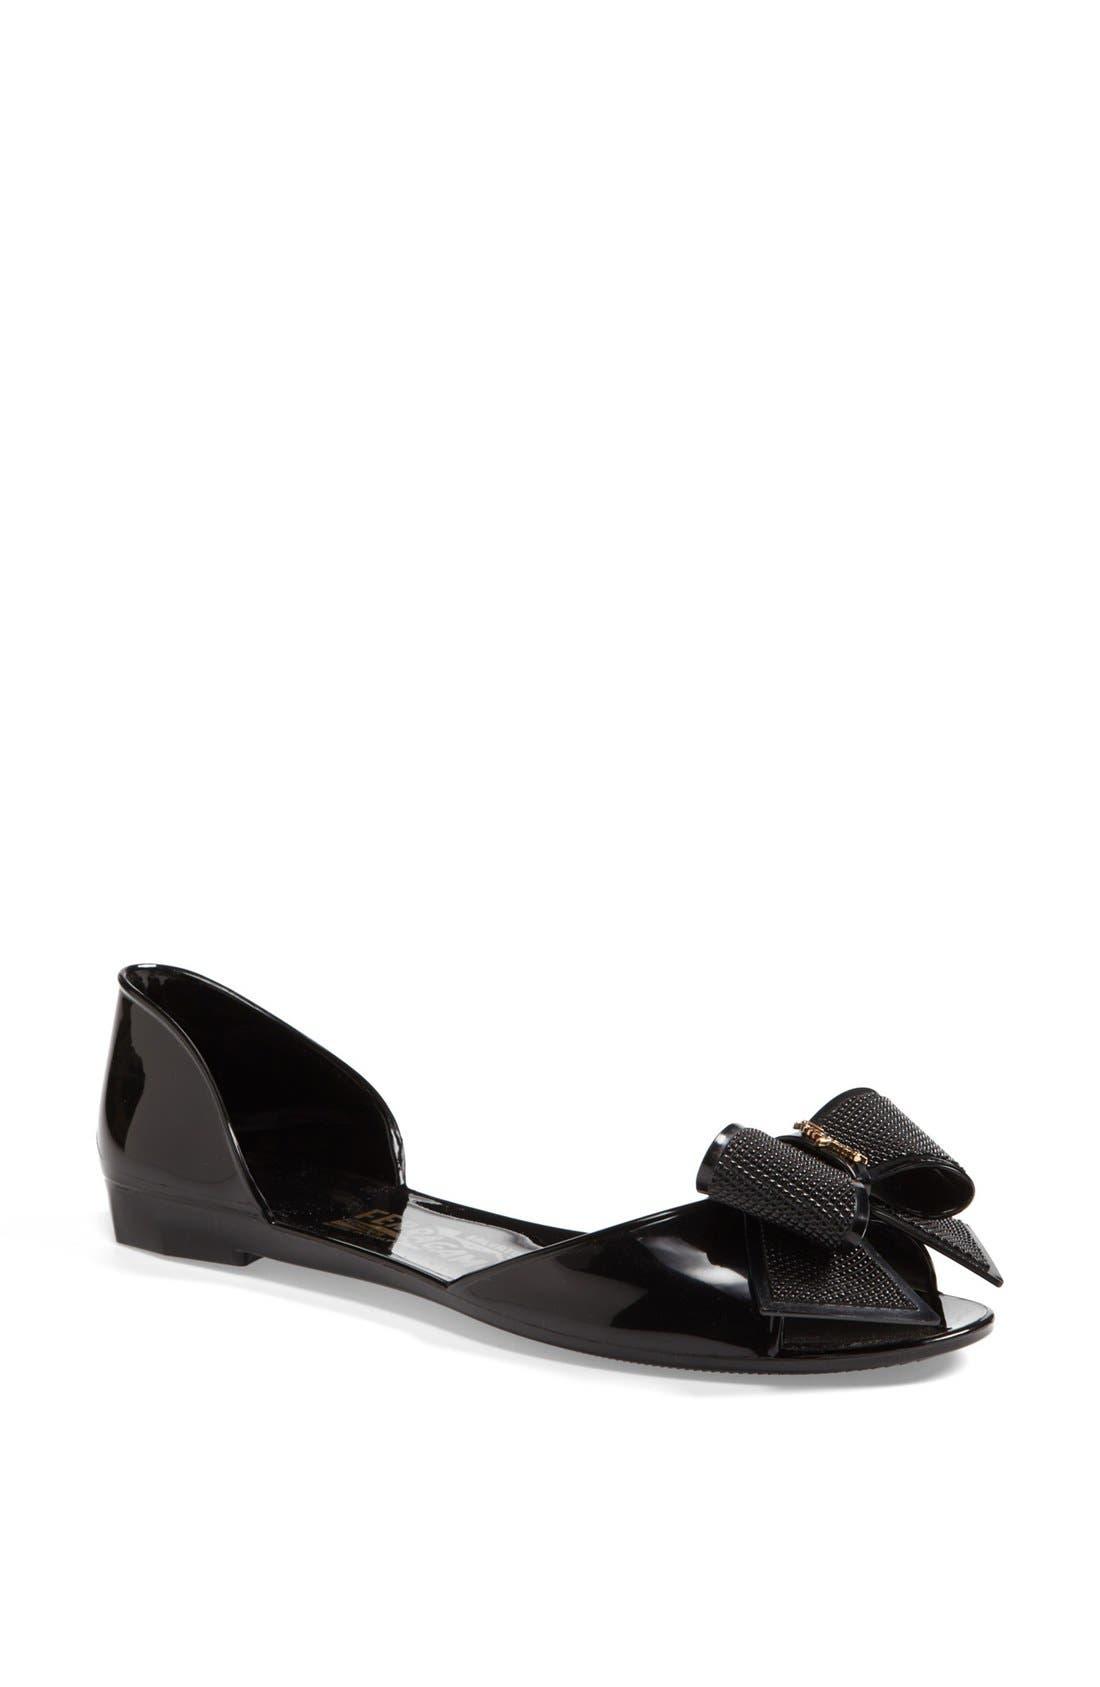 Alternate Image 1 Selected - Salvatore Ferragamo 'Barbados' Flat Sandal